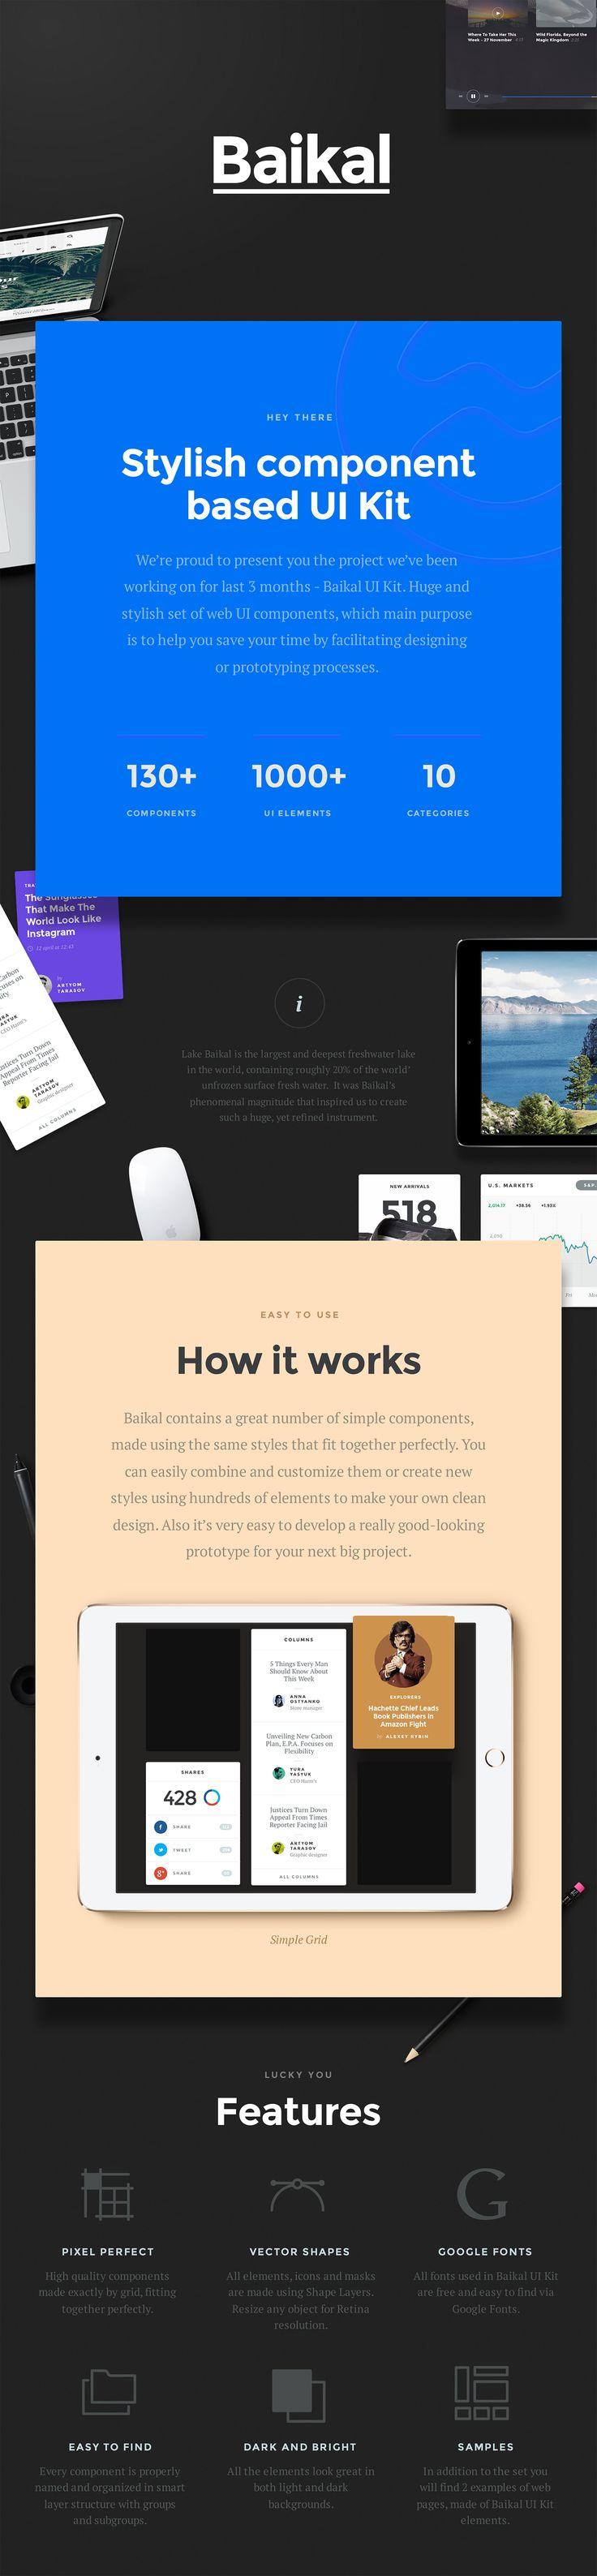 UI8 — Products — Baikal UI Kit